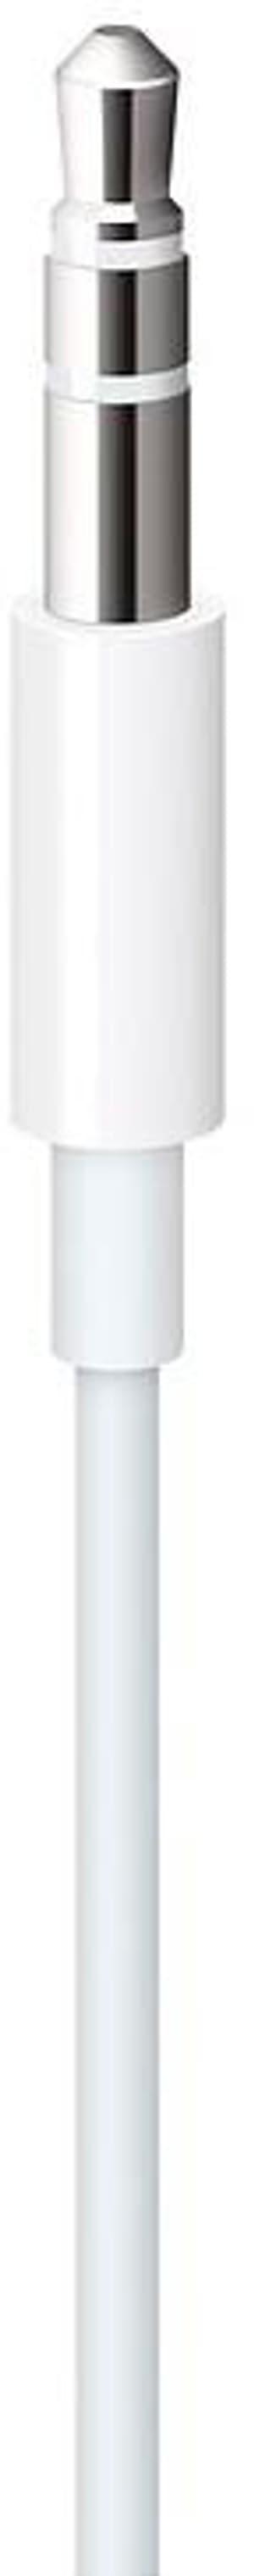 Câble audio Apple Lightning - Fiche 3,5 mm 1.2 m